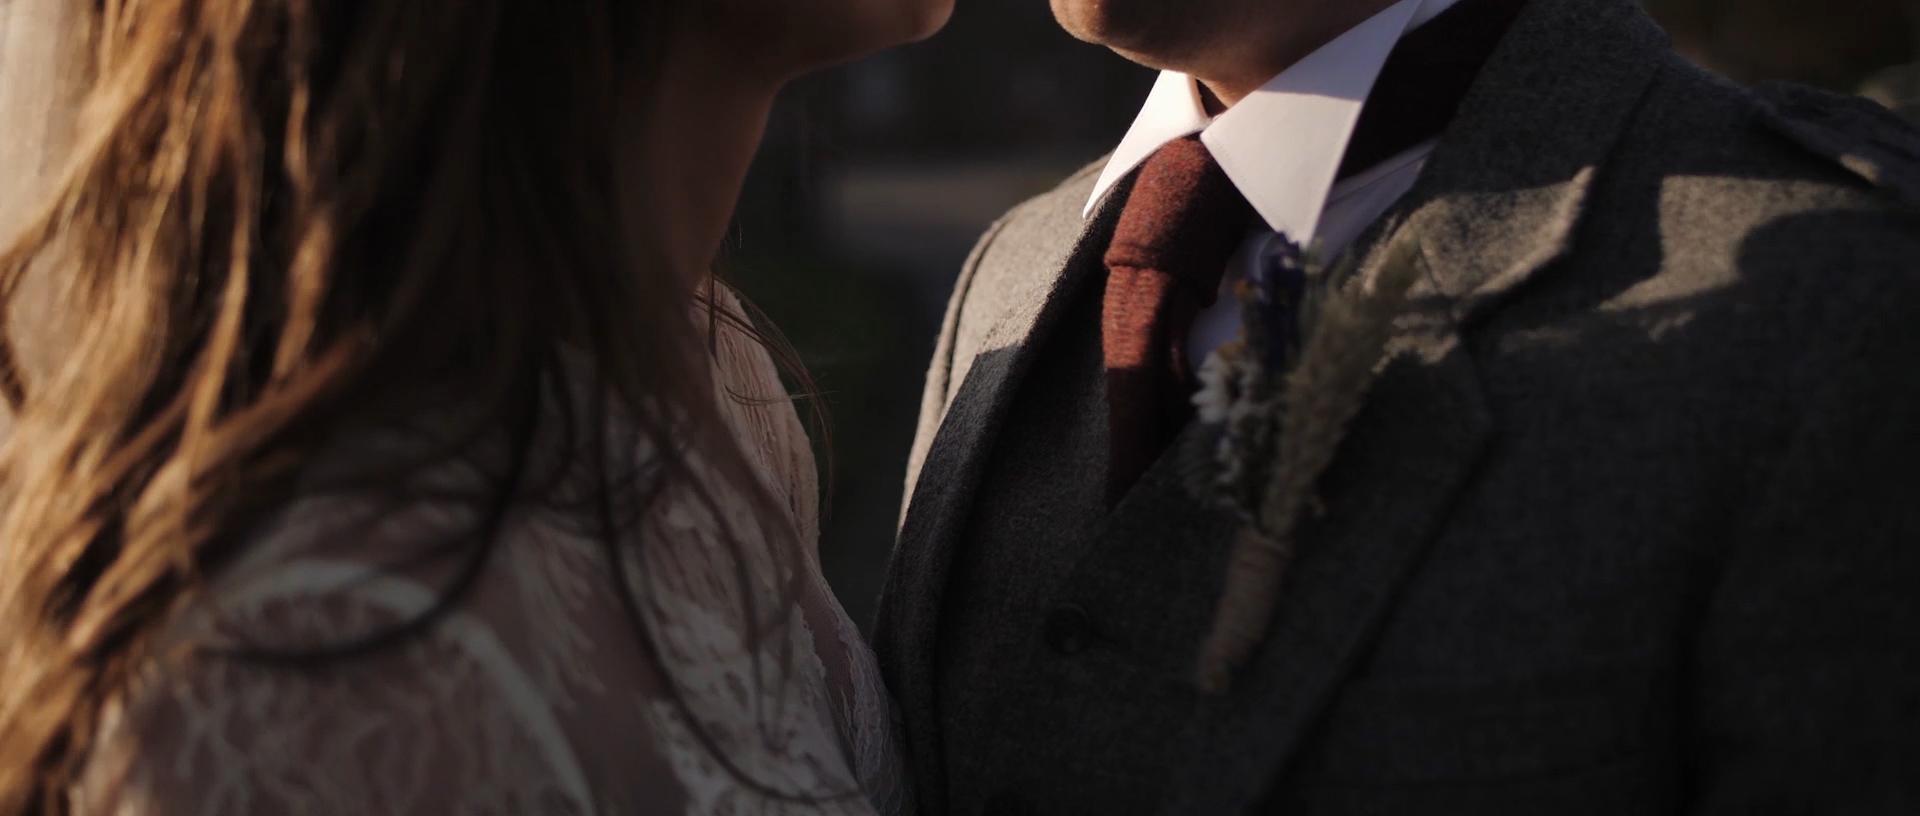 loch-lomond-wedding-videographer_LL_04.jpg